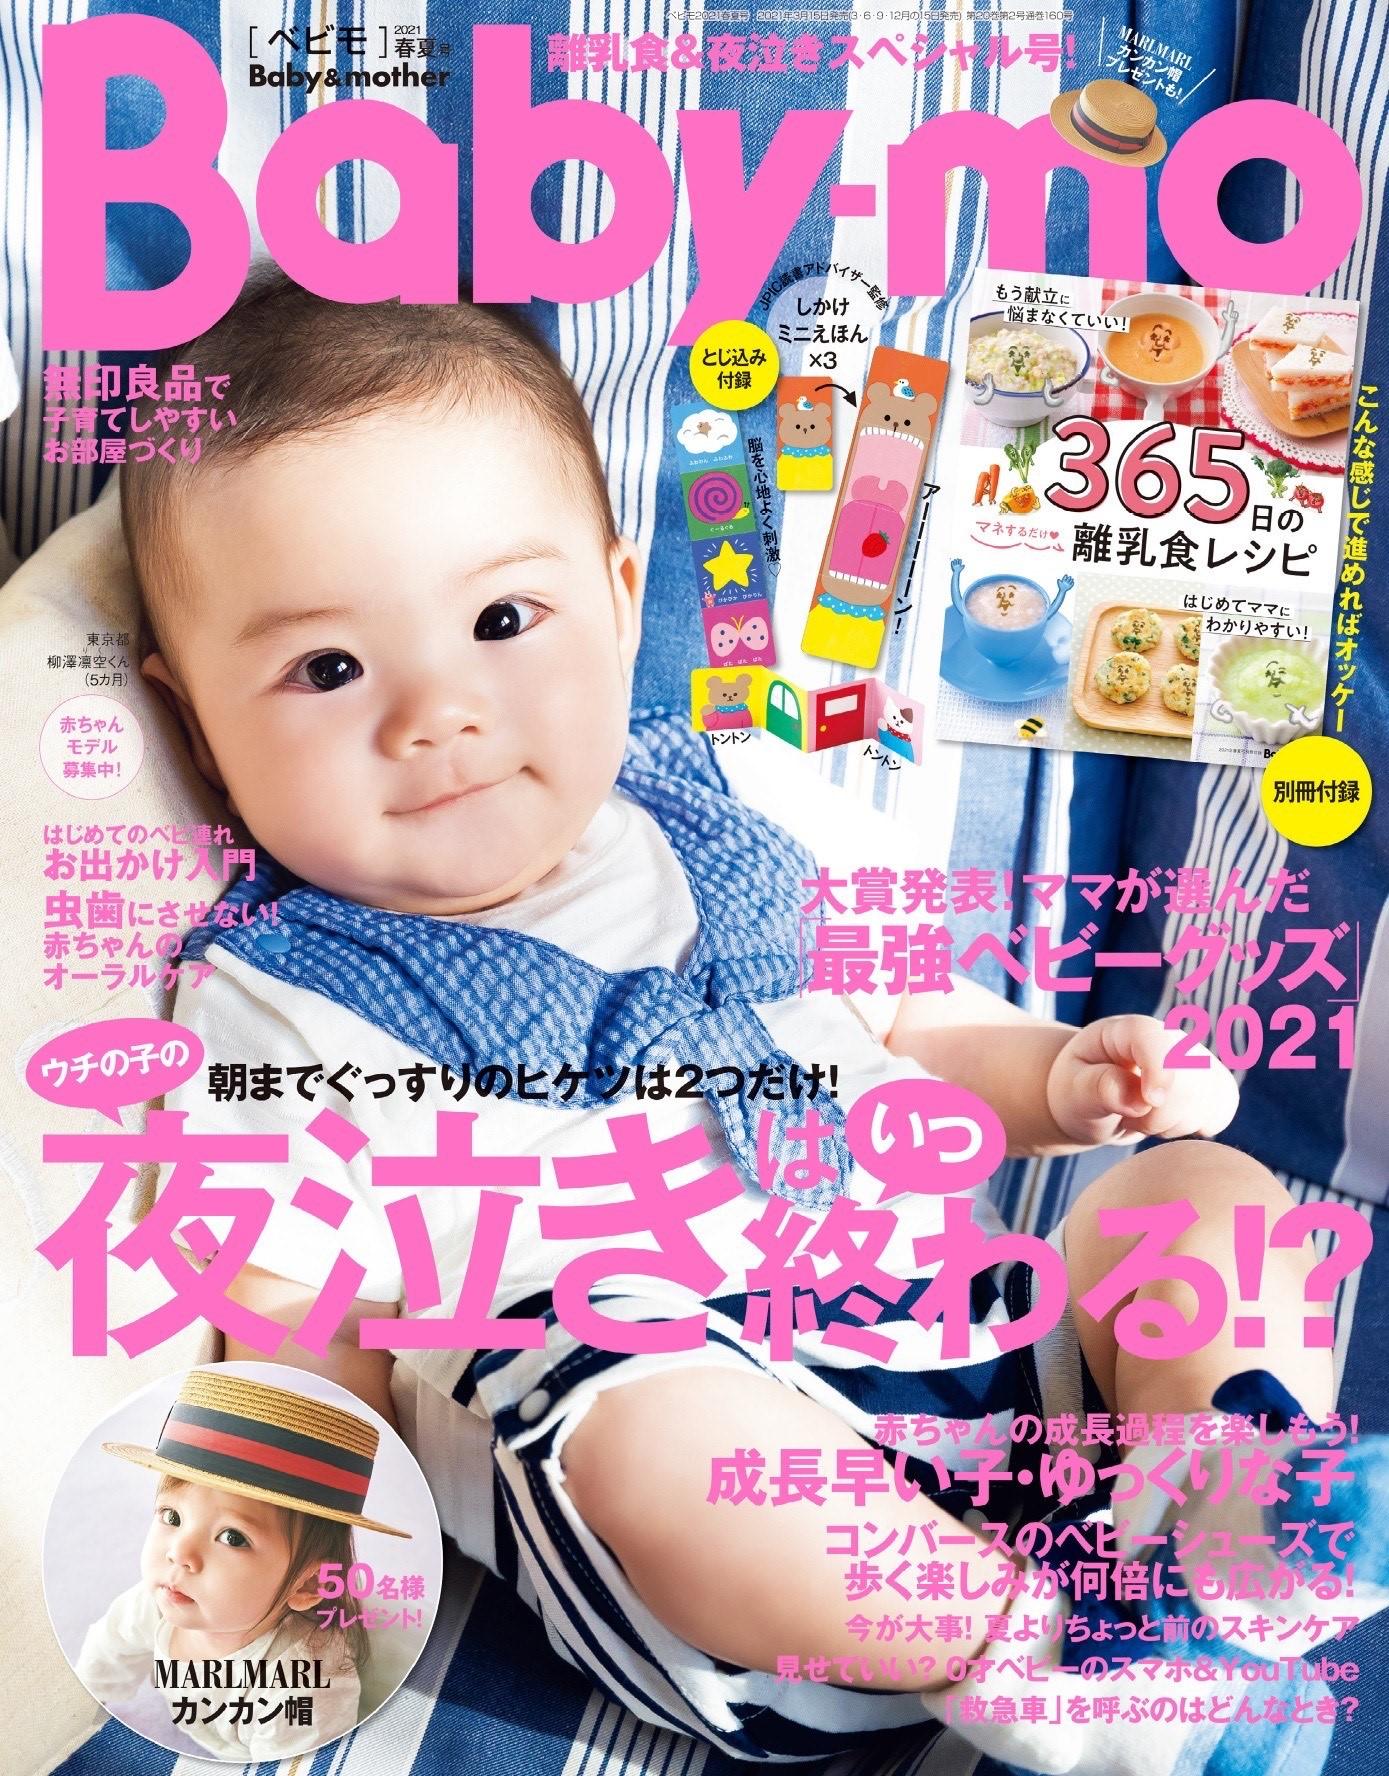 Baby-mo春夏号にMuToto〈ムトト〉が紹介されました!